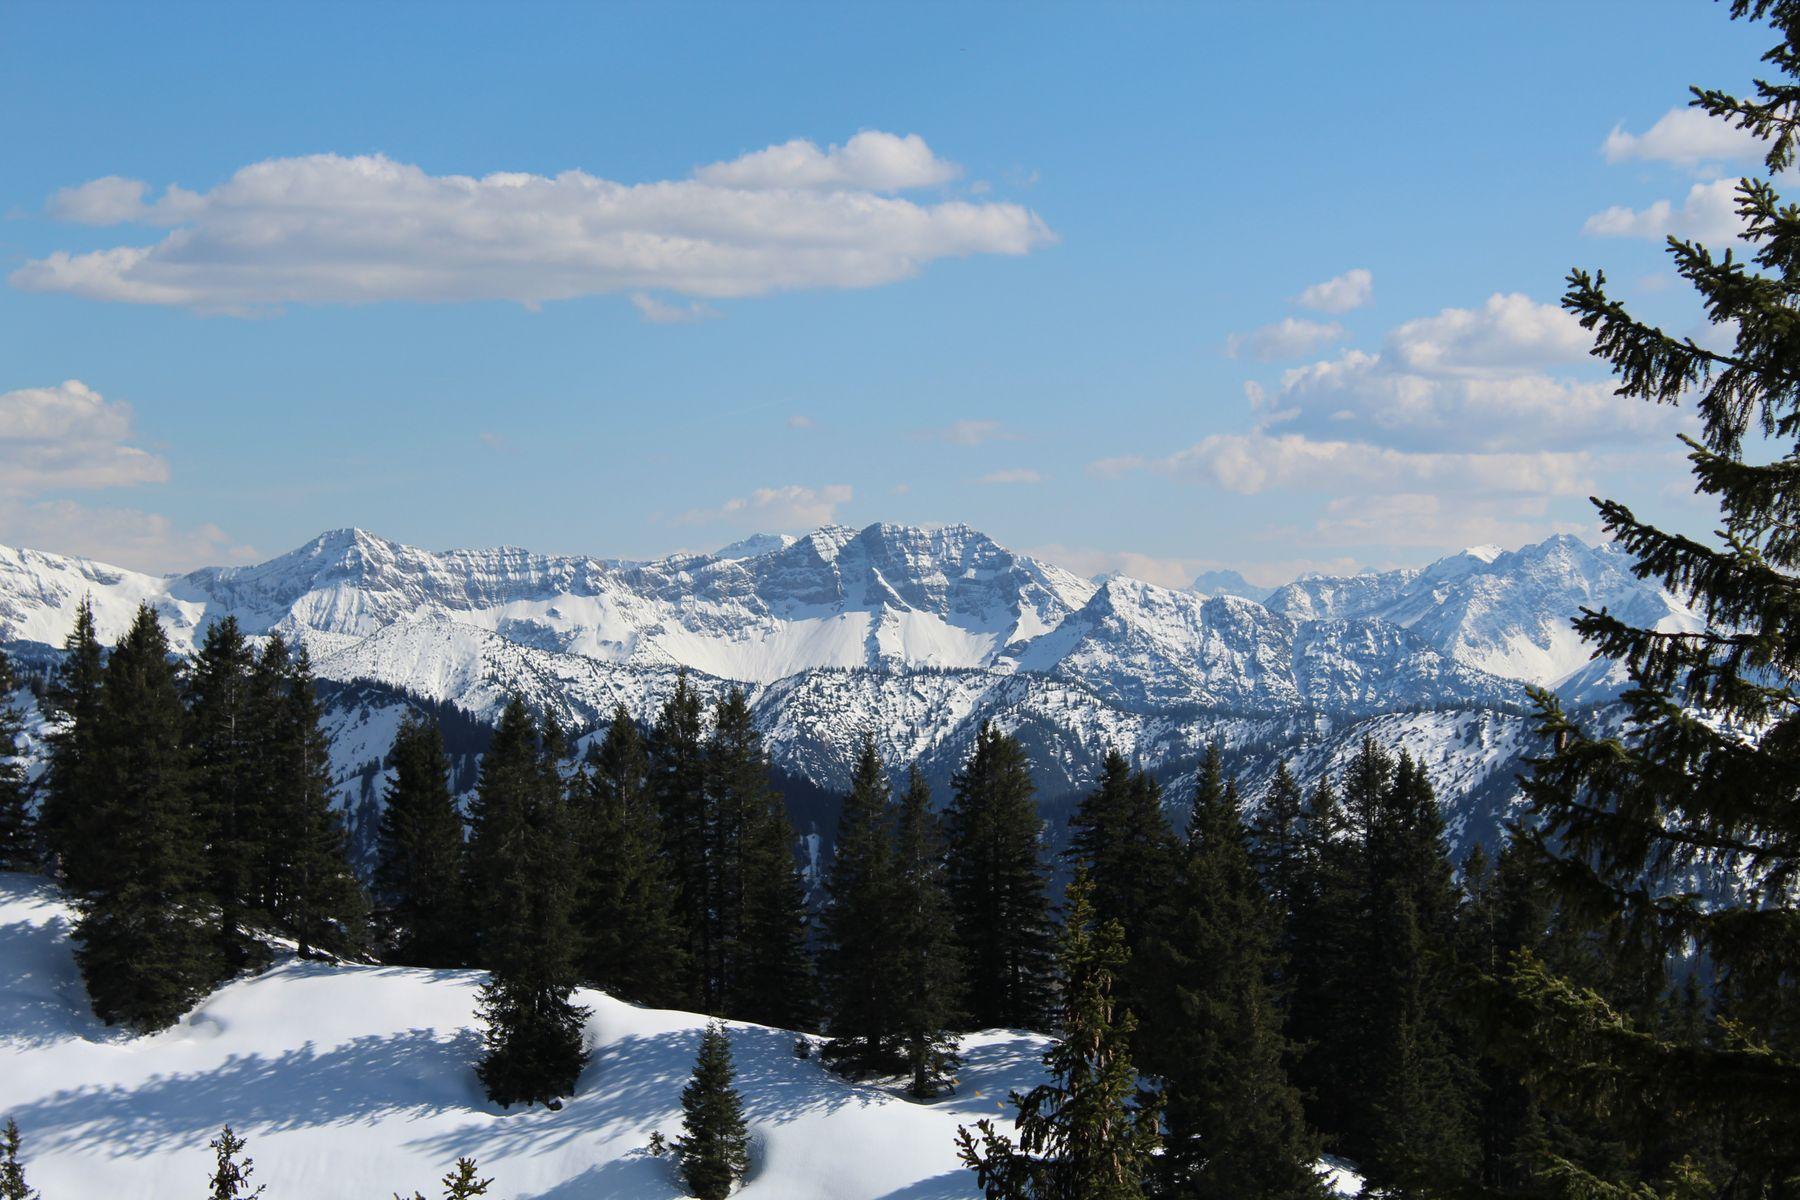 Горы, снег и лес